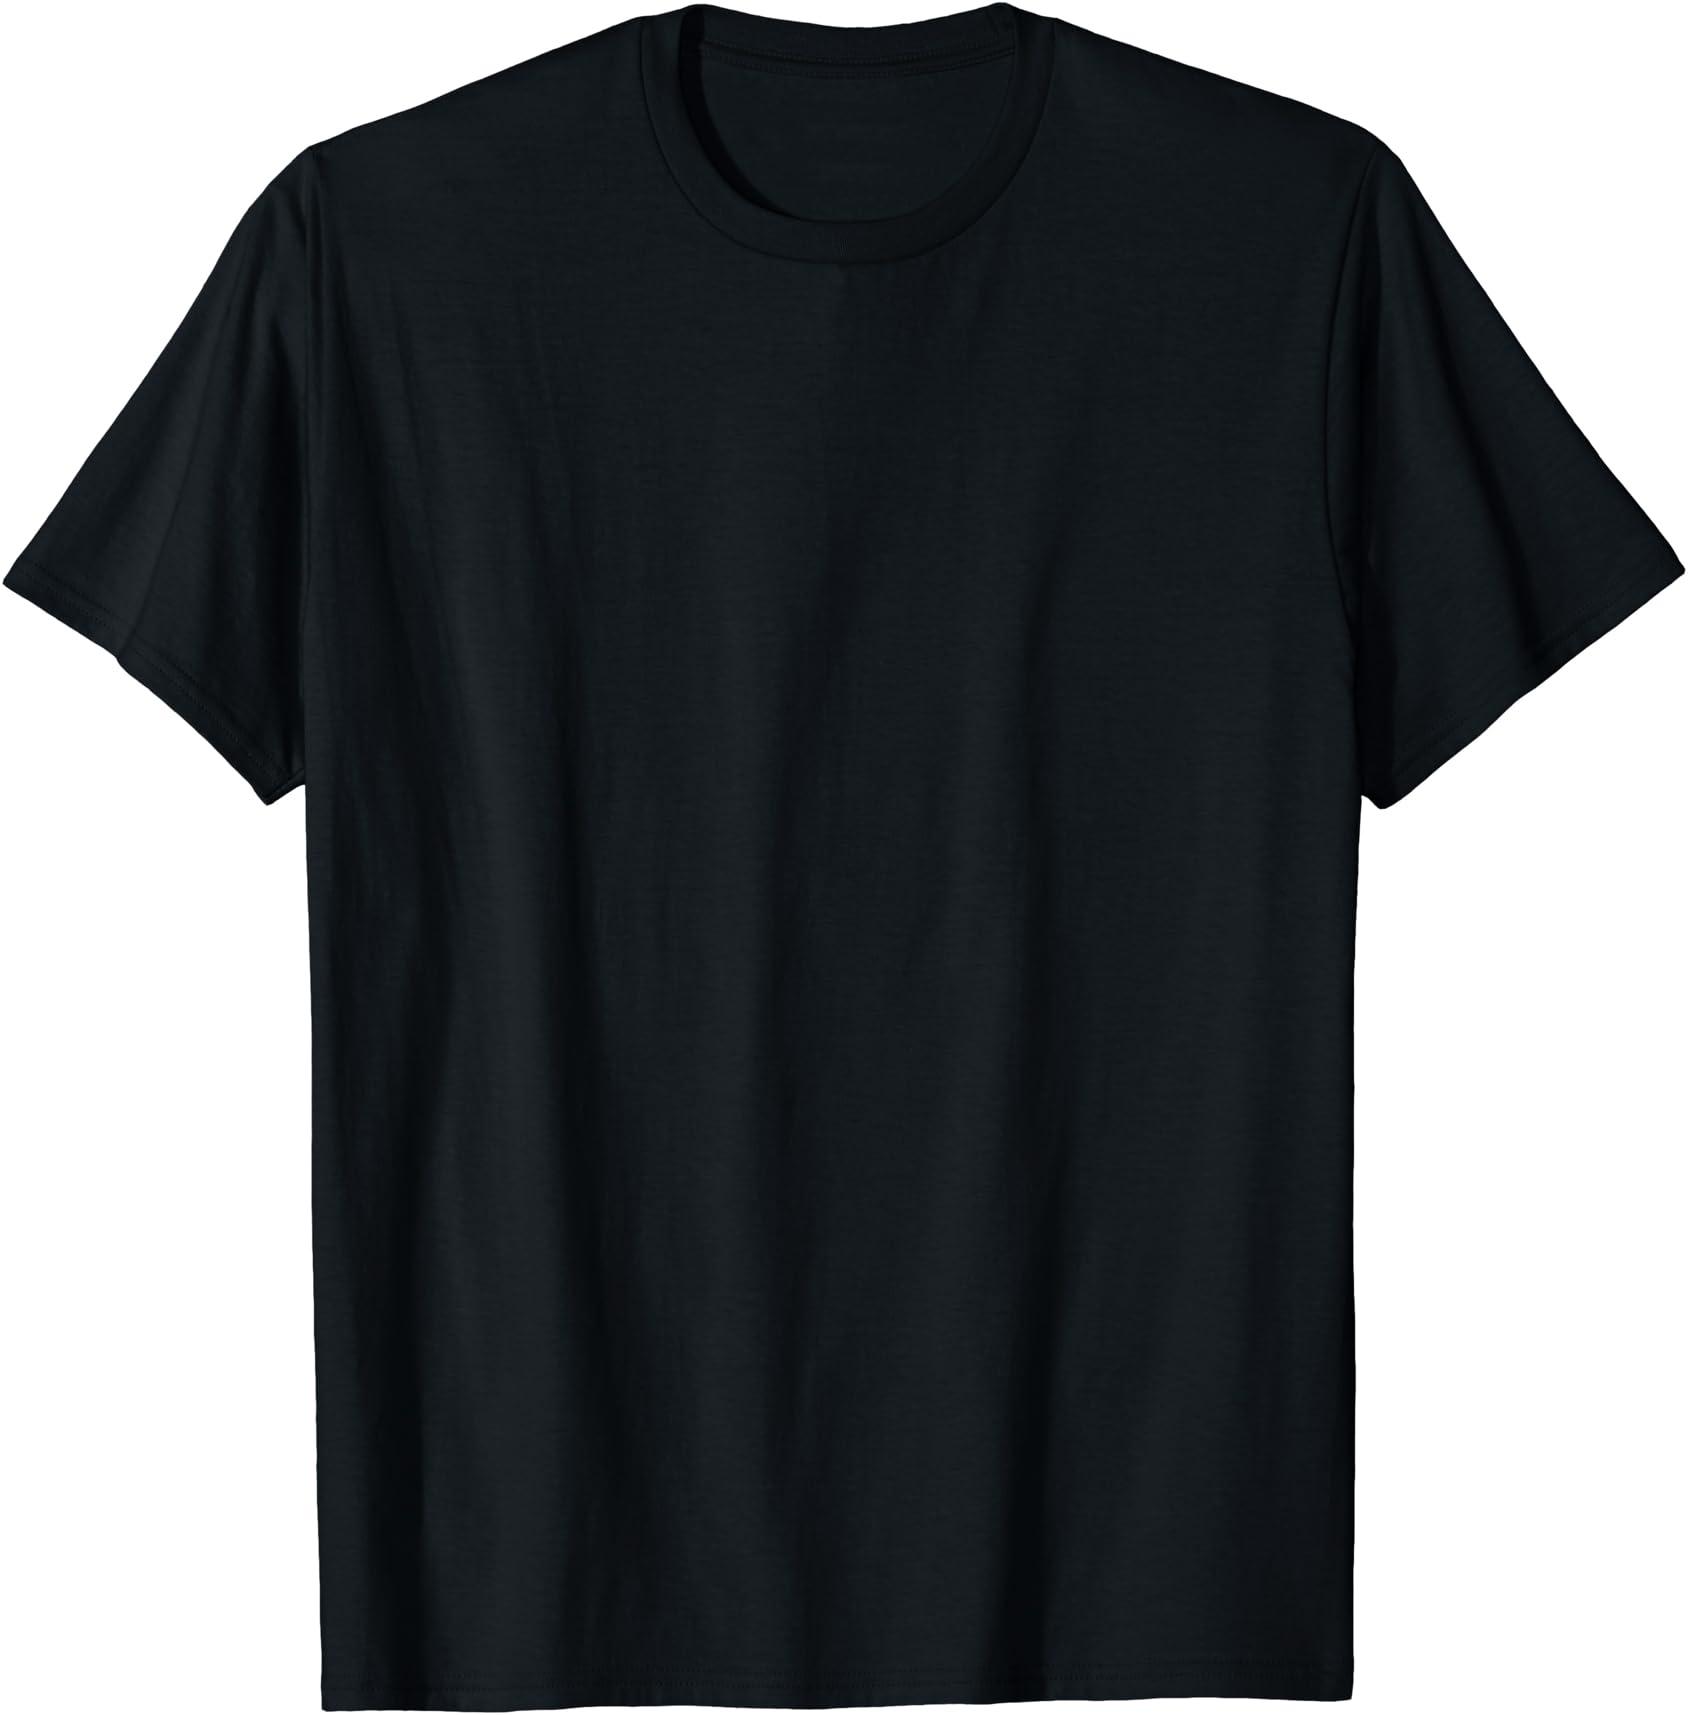 Websi Wihey Hubby Black Fashion Boys t-Shirts for Youth